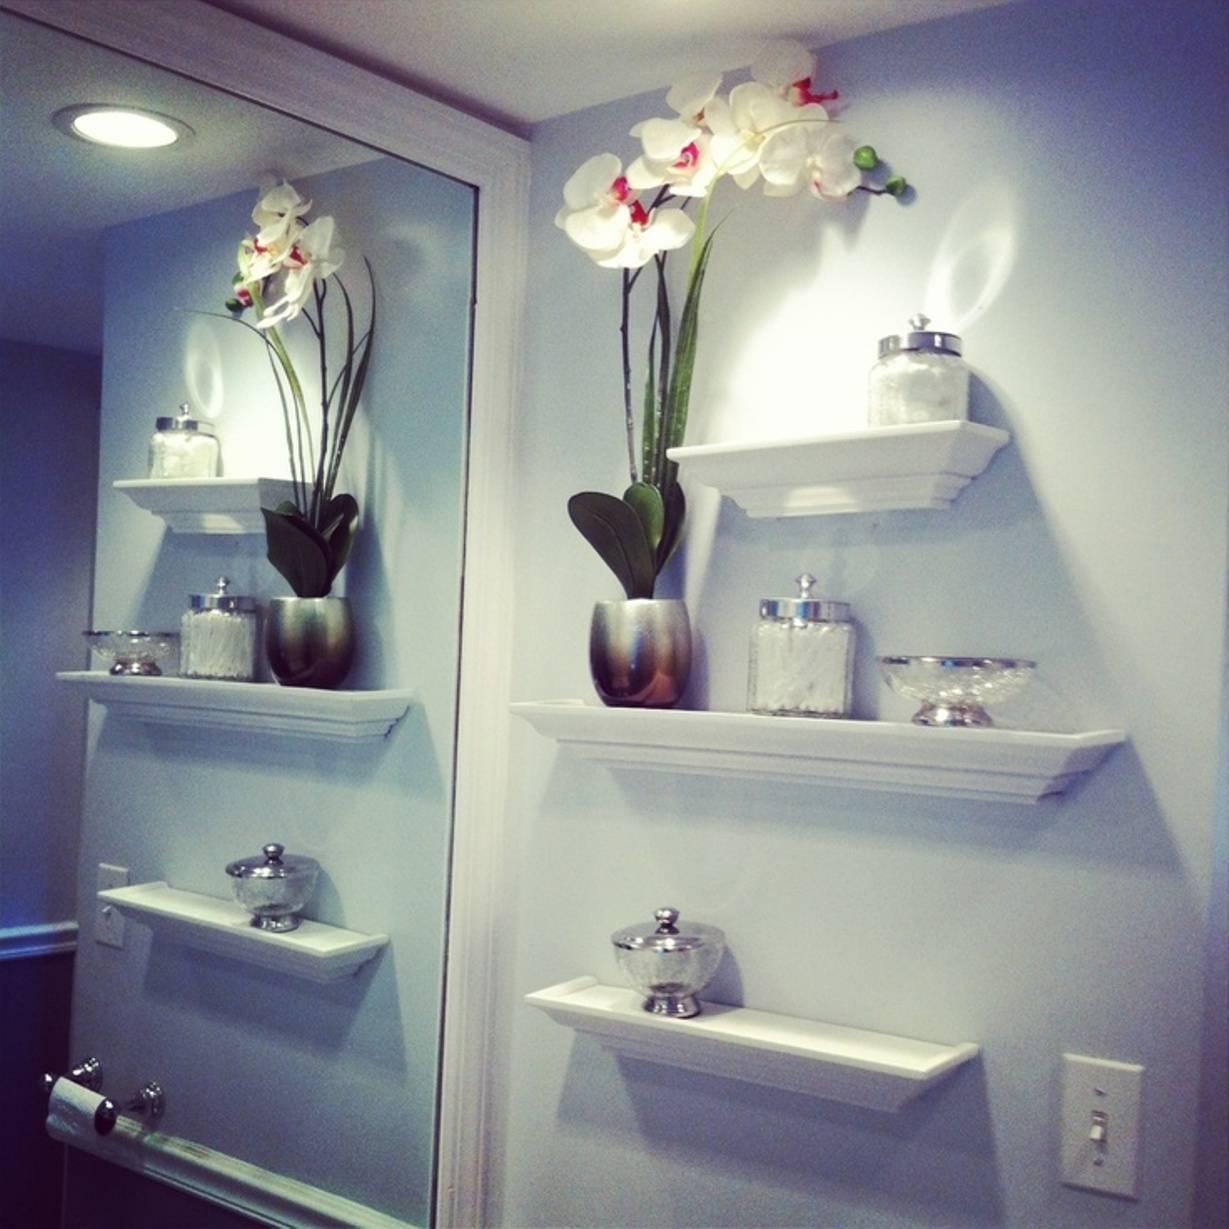 Bathroom : Splendid Cool Extraordinary Diy Bathroom Wall Decor With Regard To Most Up To Date Contemporary Bathroom Wall Art (View 17 of 20)